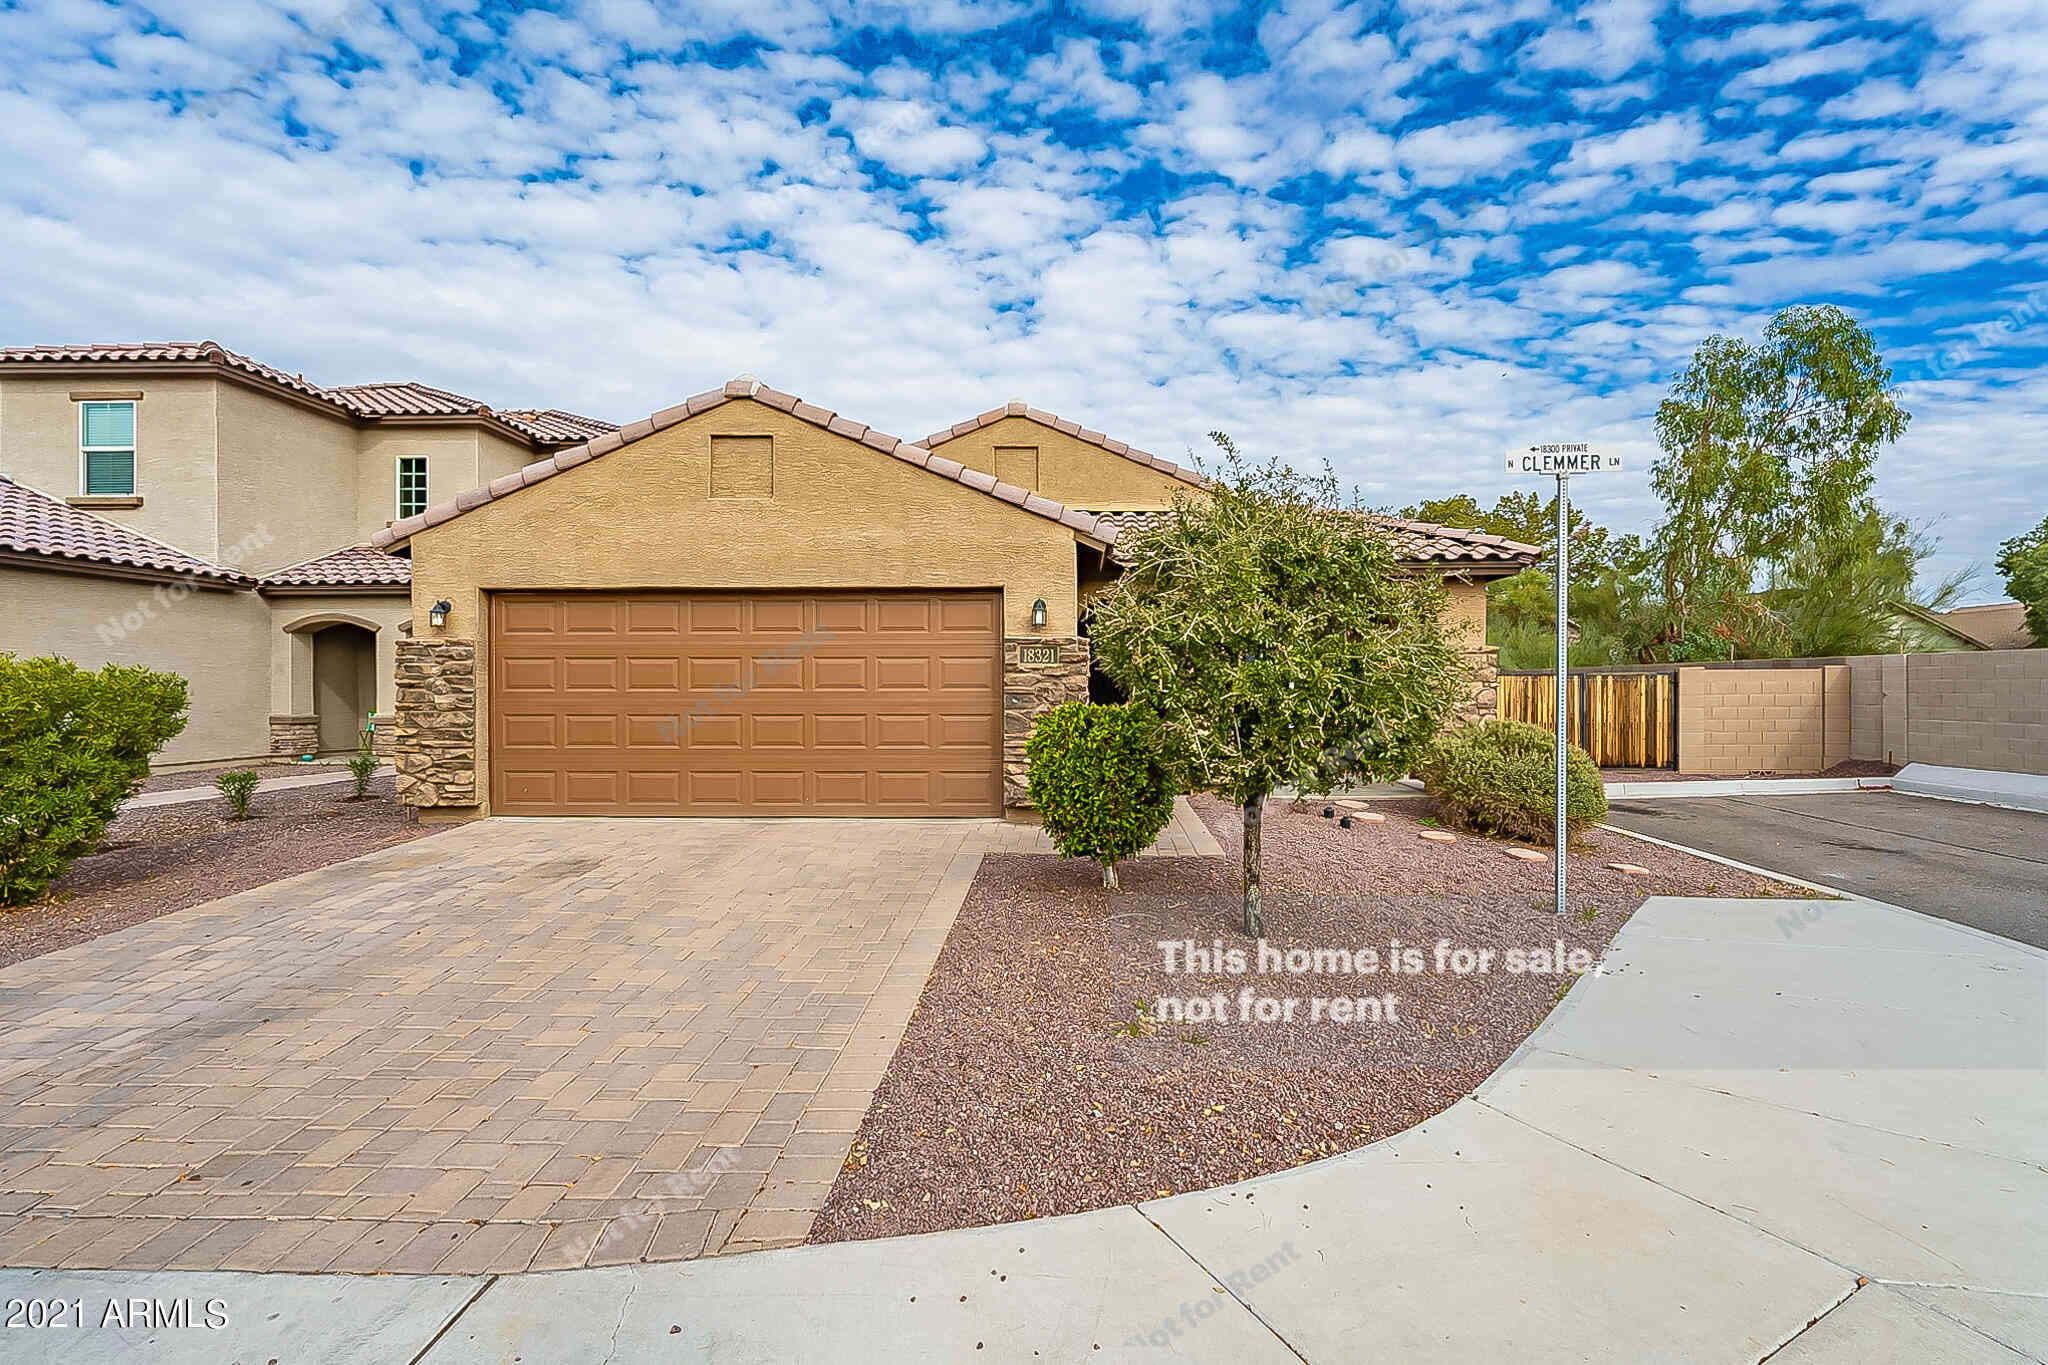 18321 N CLEMMER Lane, Phoenix, AZ, 85022,